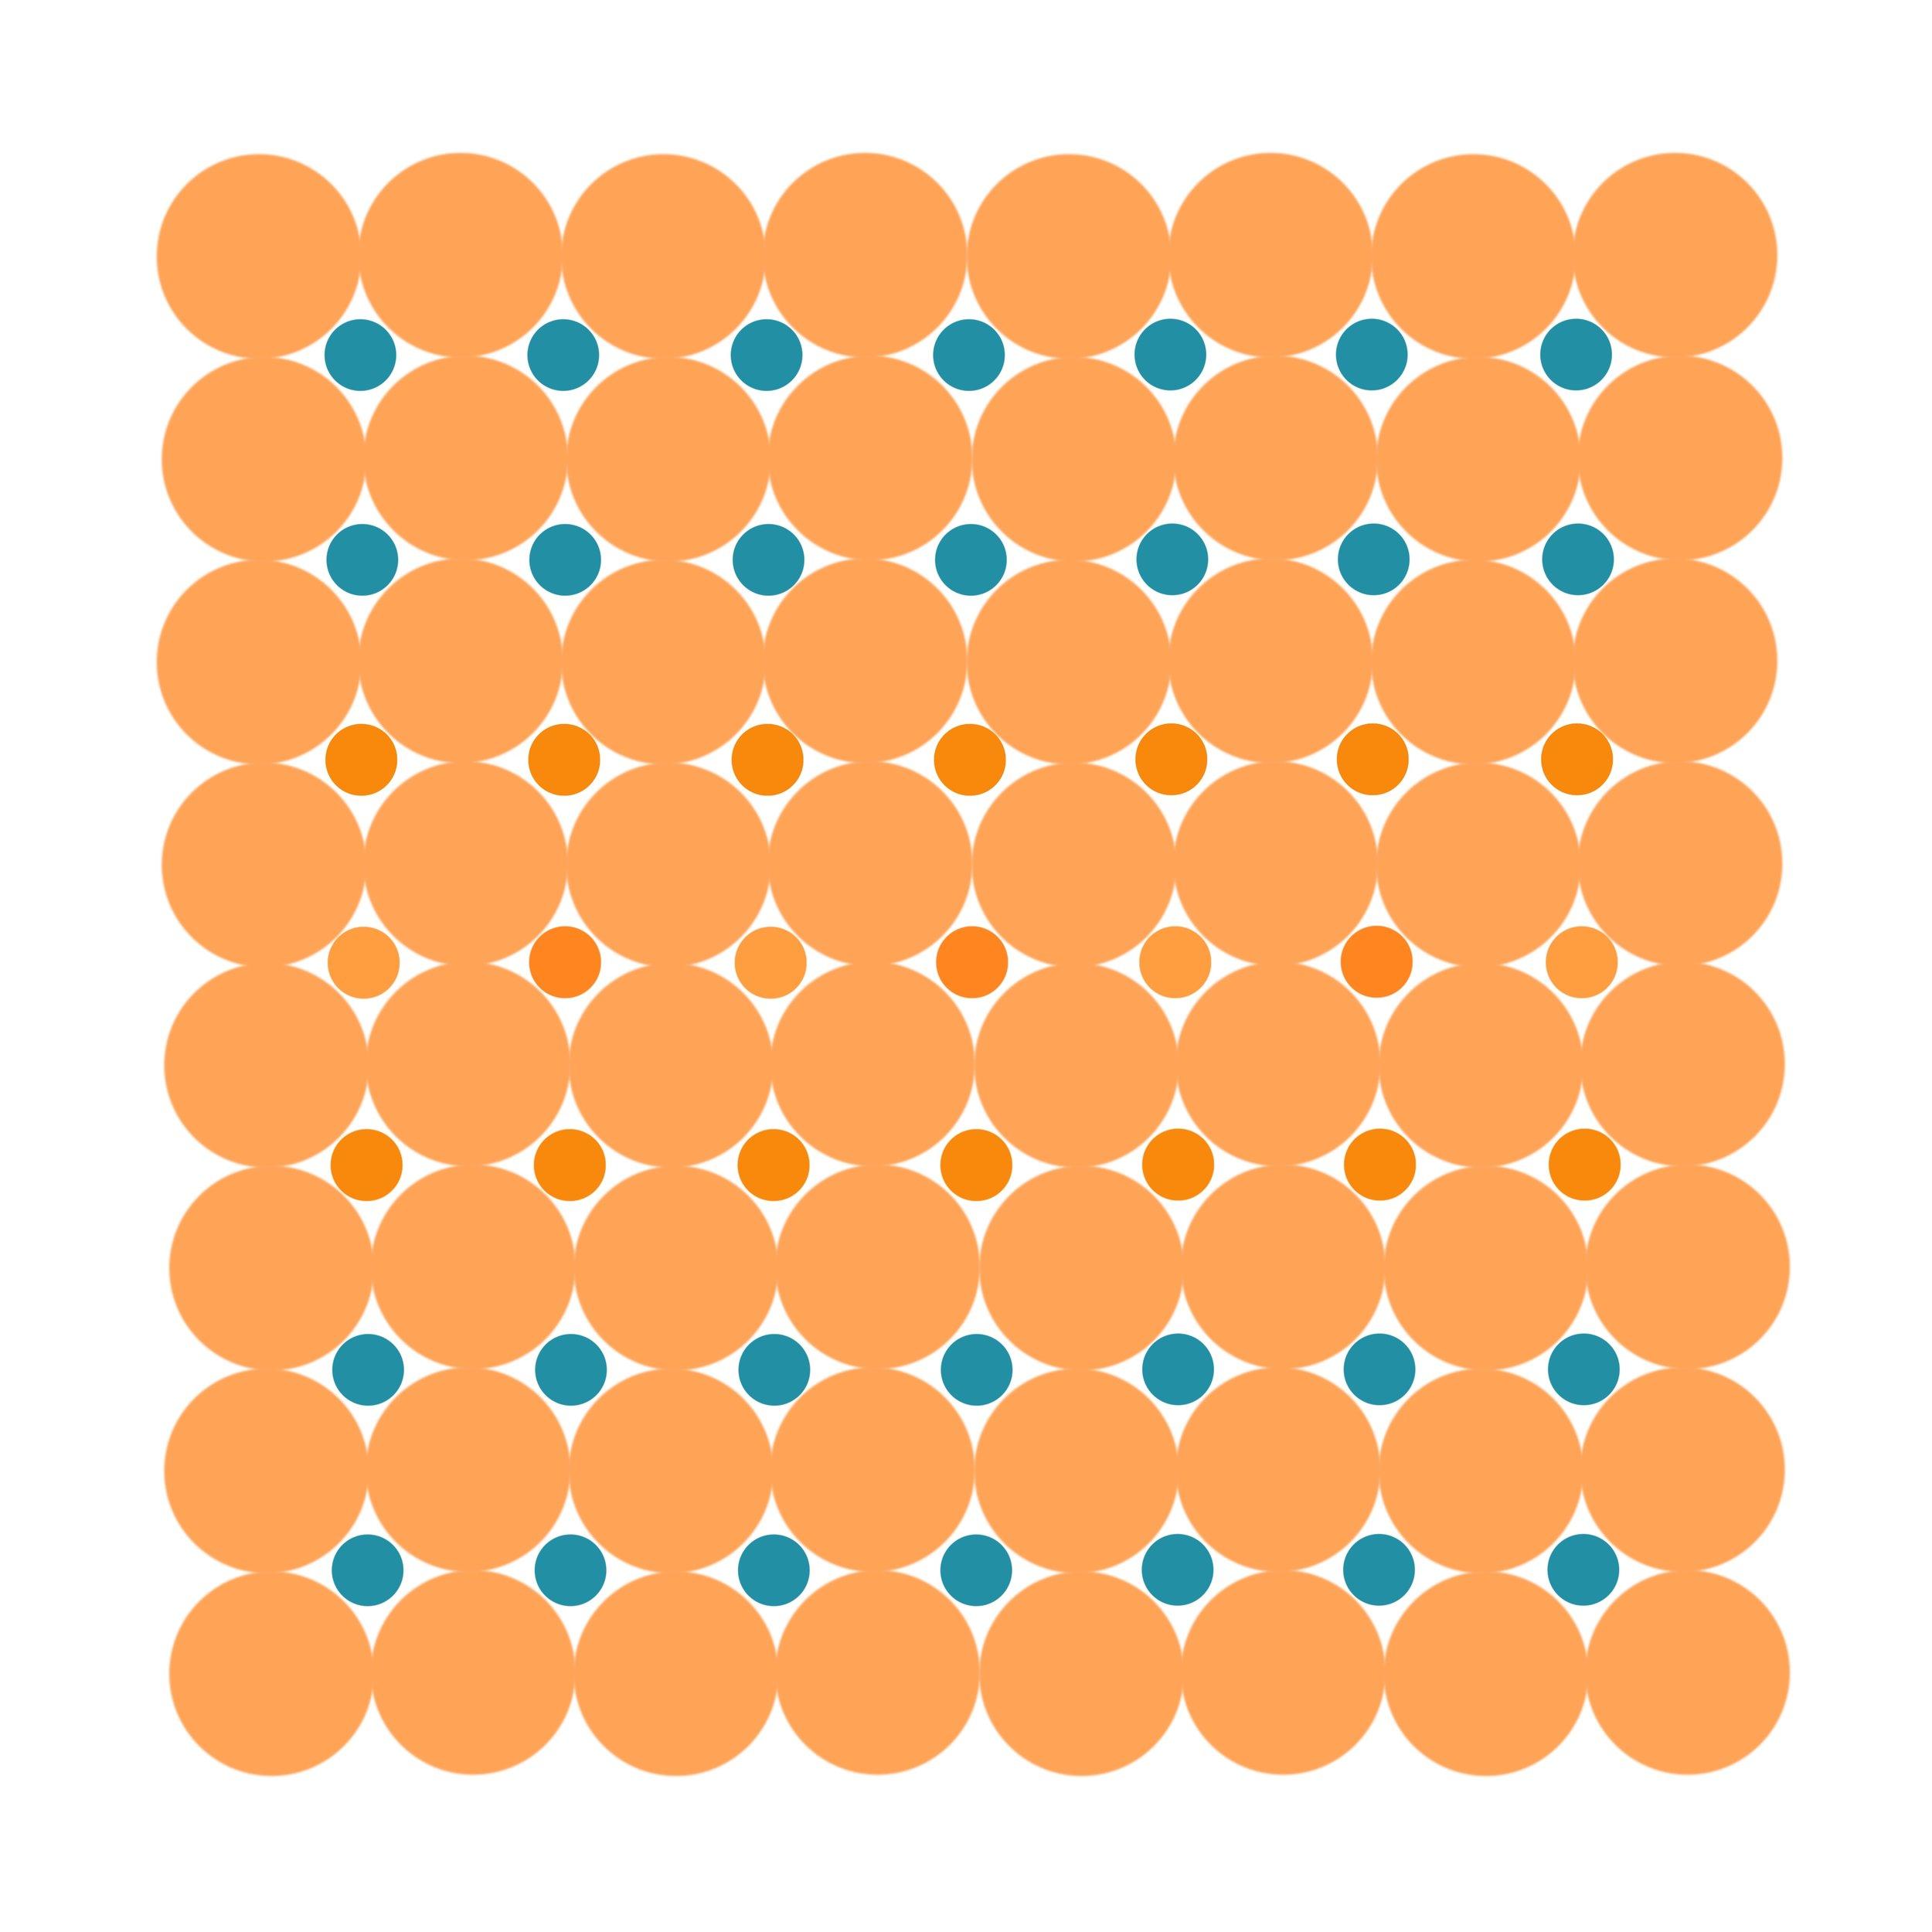 Dot Structure 7 - Sweet Orange